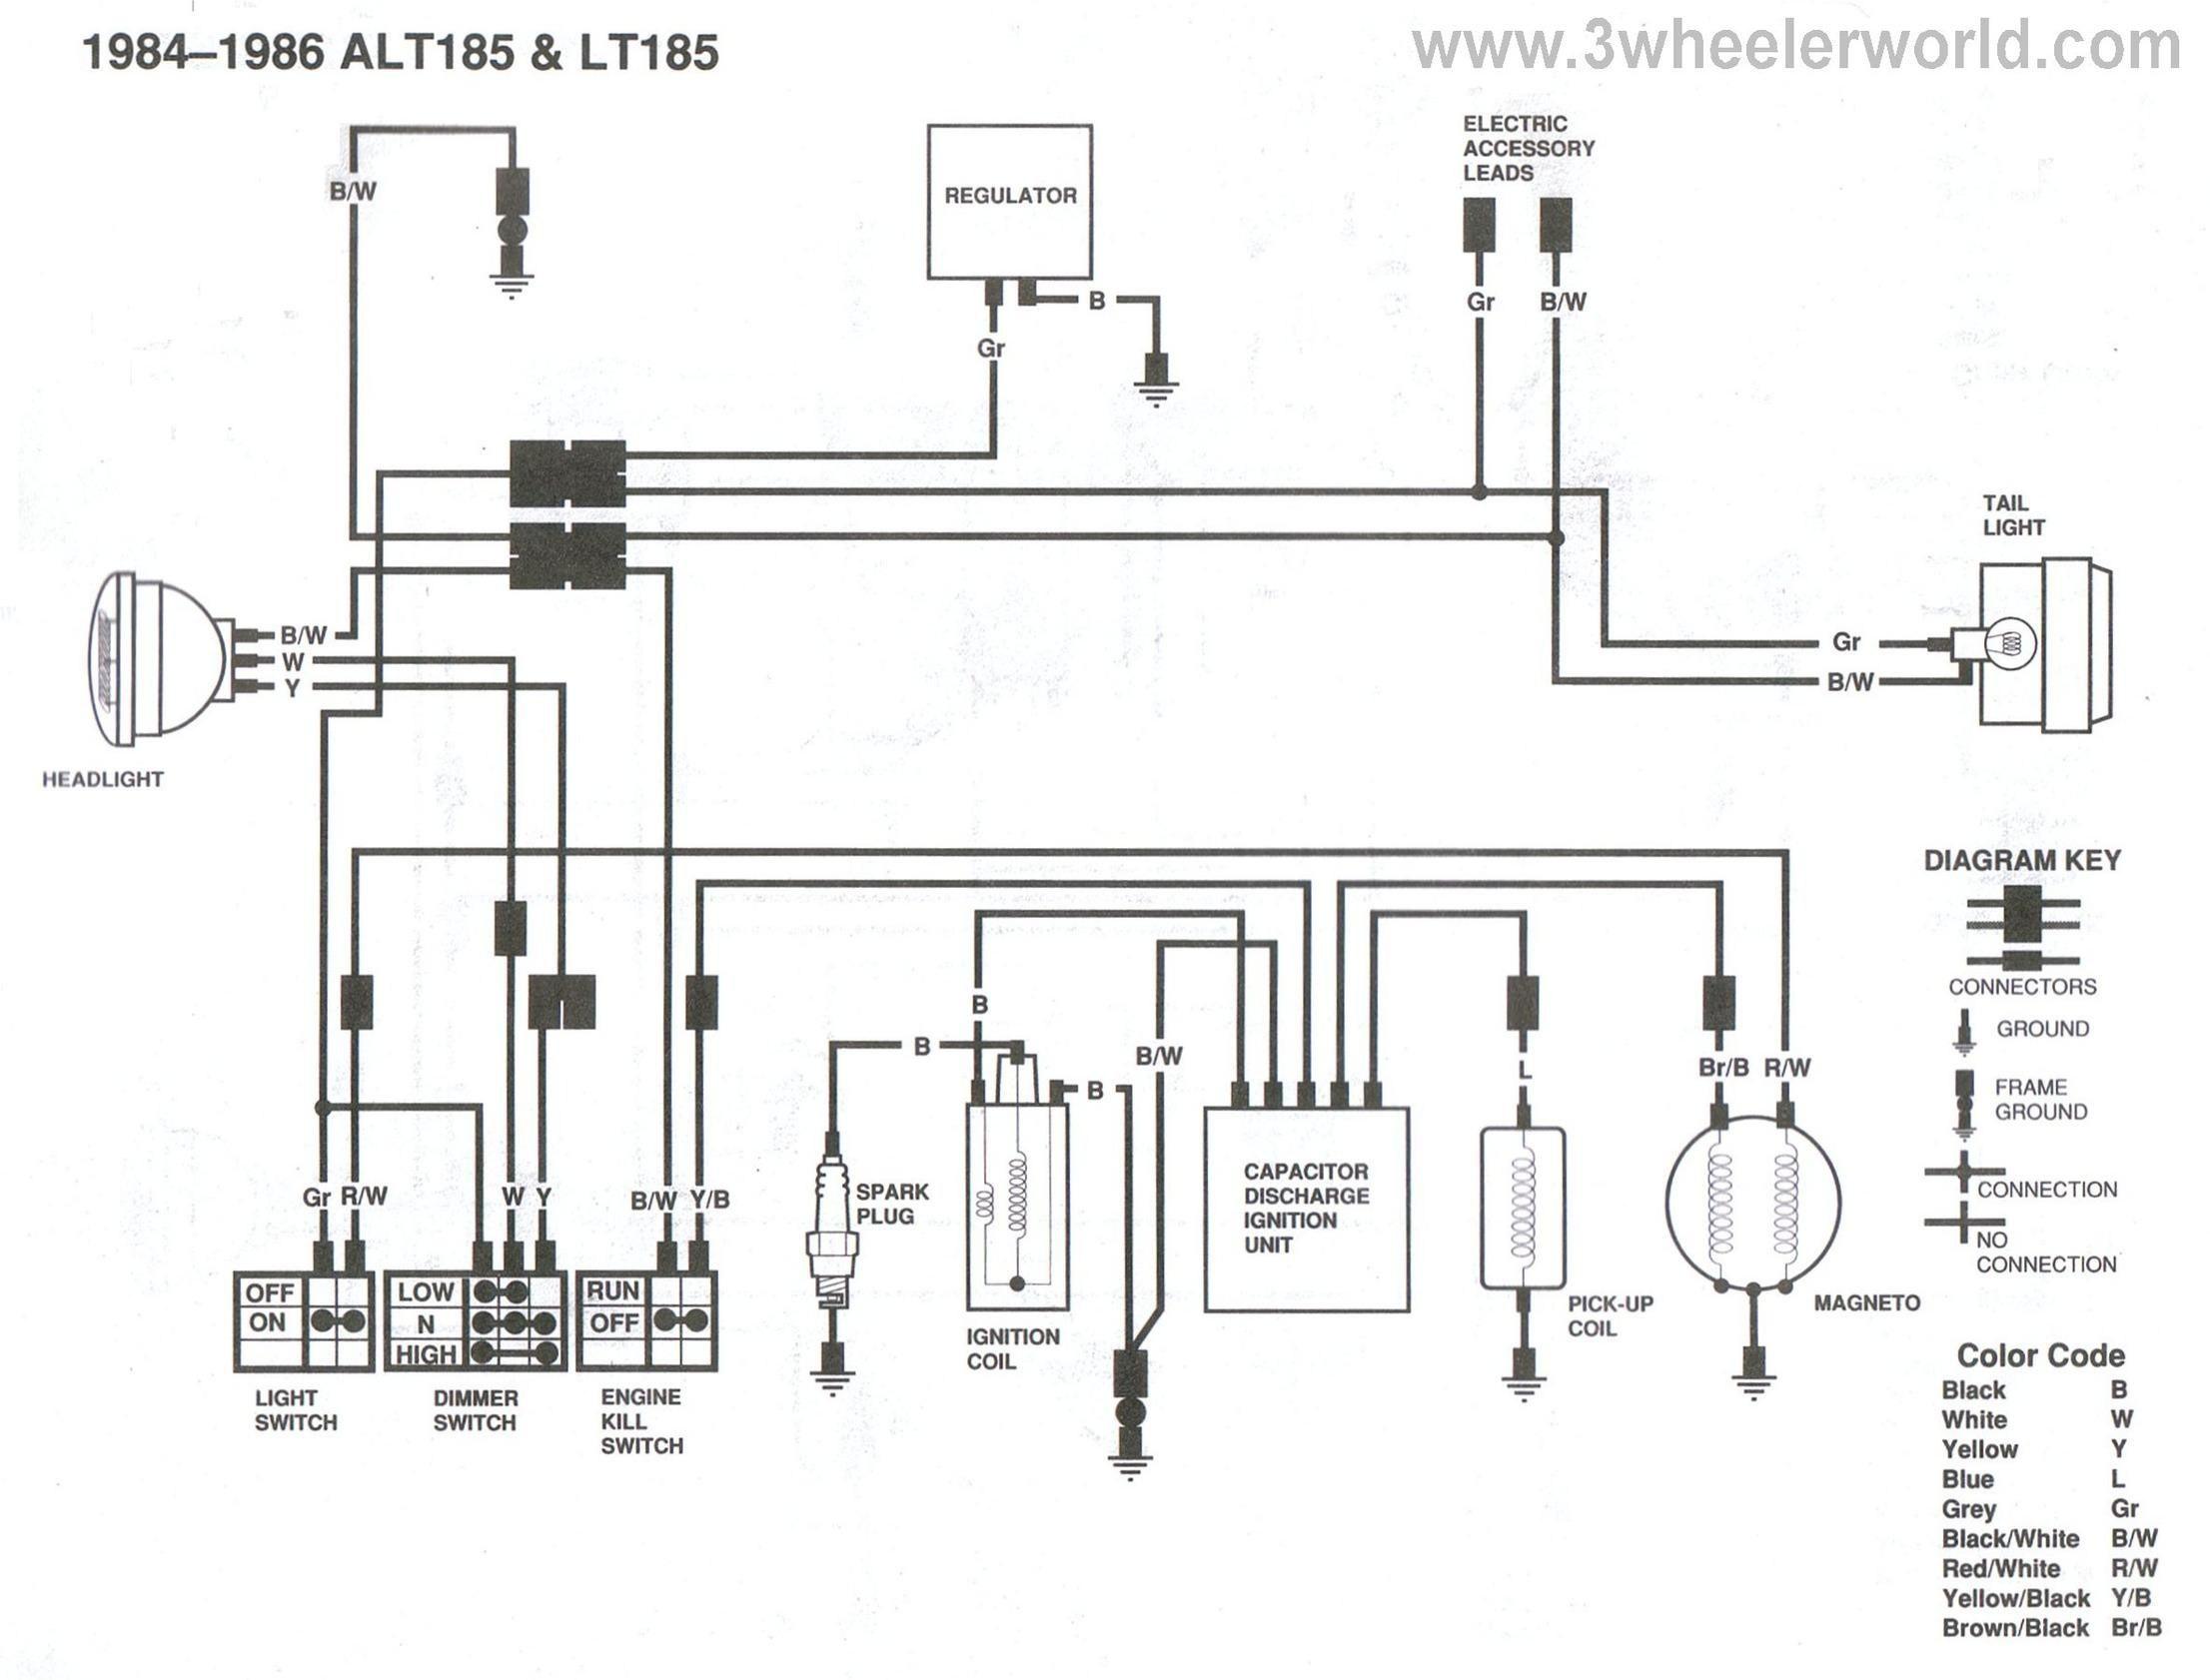 Maruti Suzuki 800 Engine Diagram Suzuki Carry Wiring Diagram Wiring Diagram toolbox Of Maruti Suzuki 800 Engine Diagram